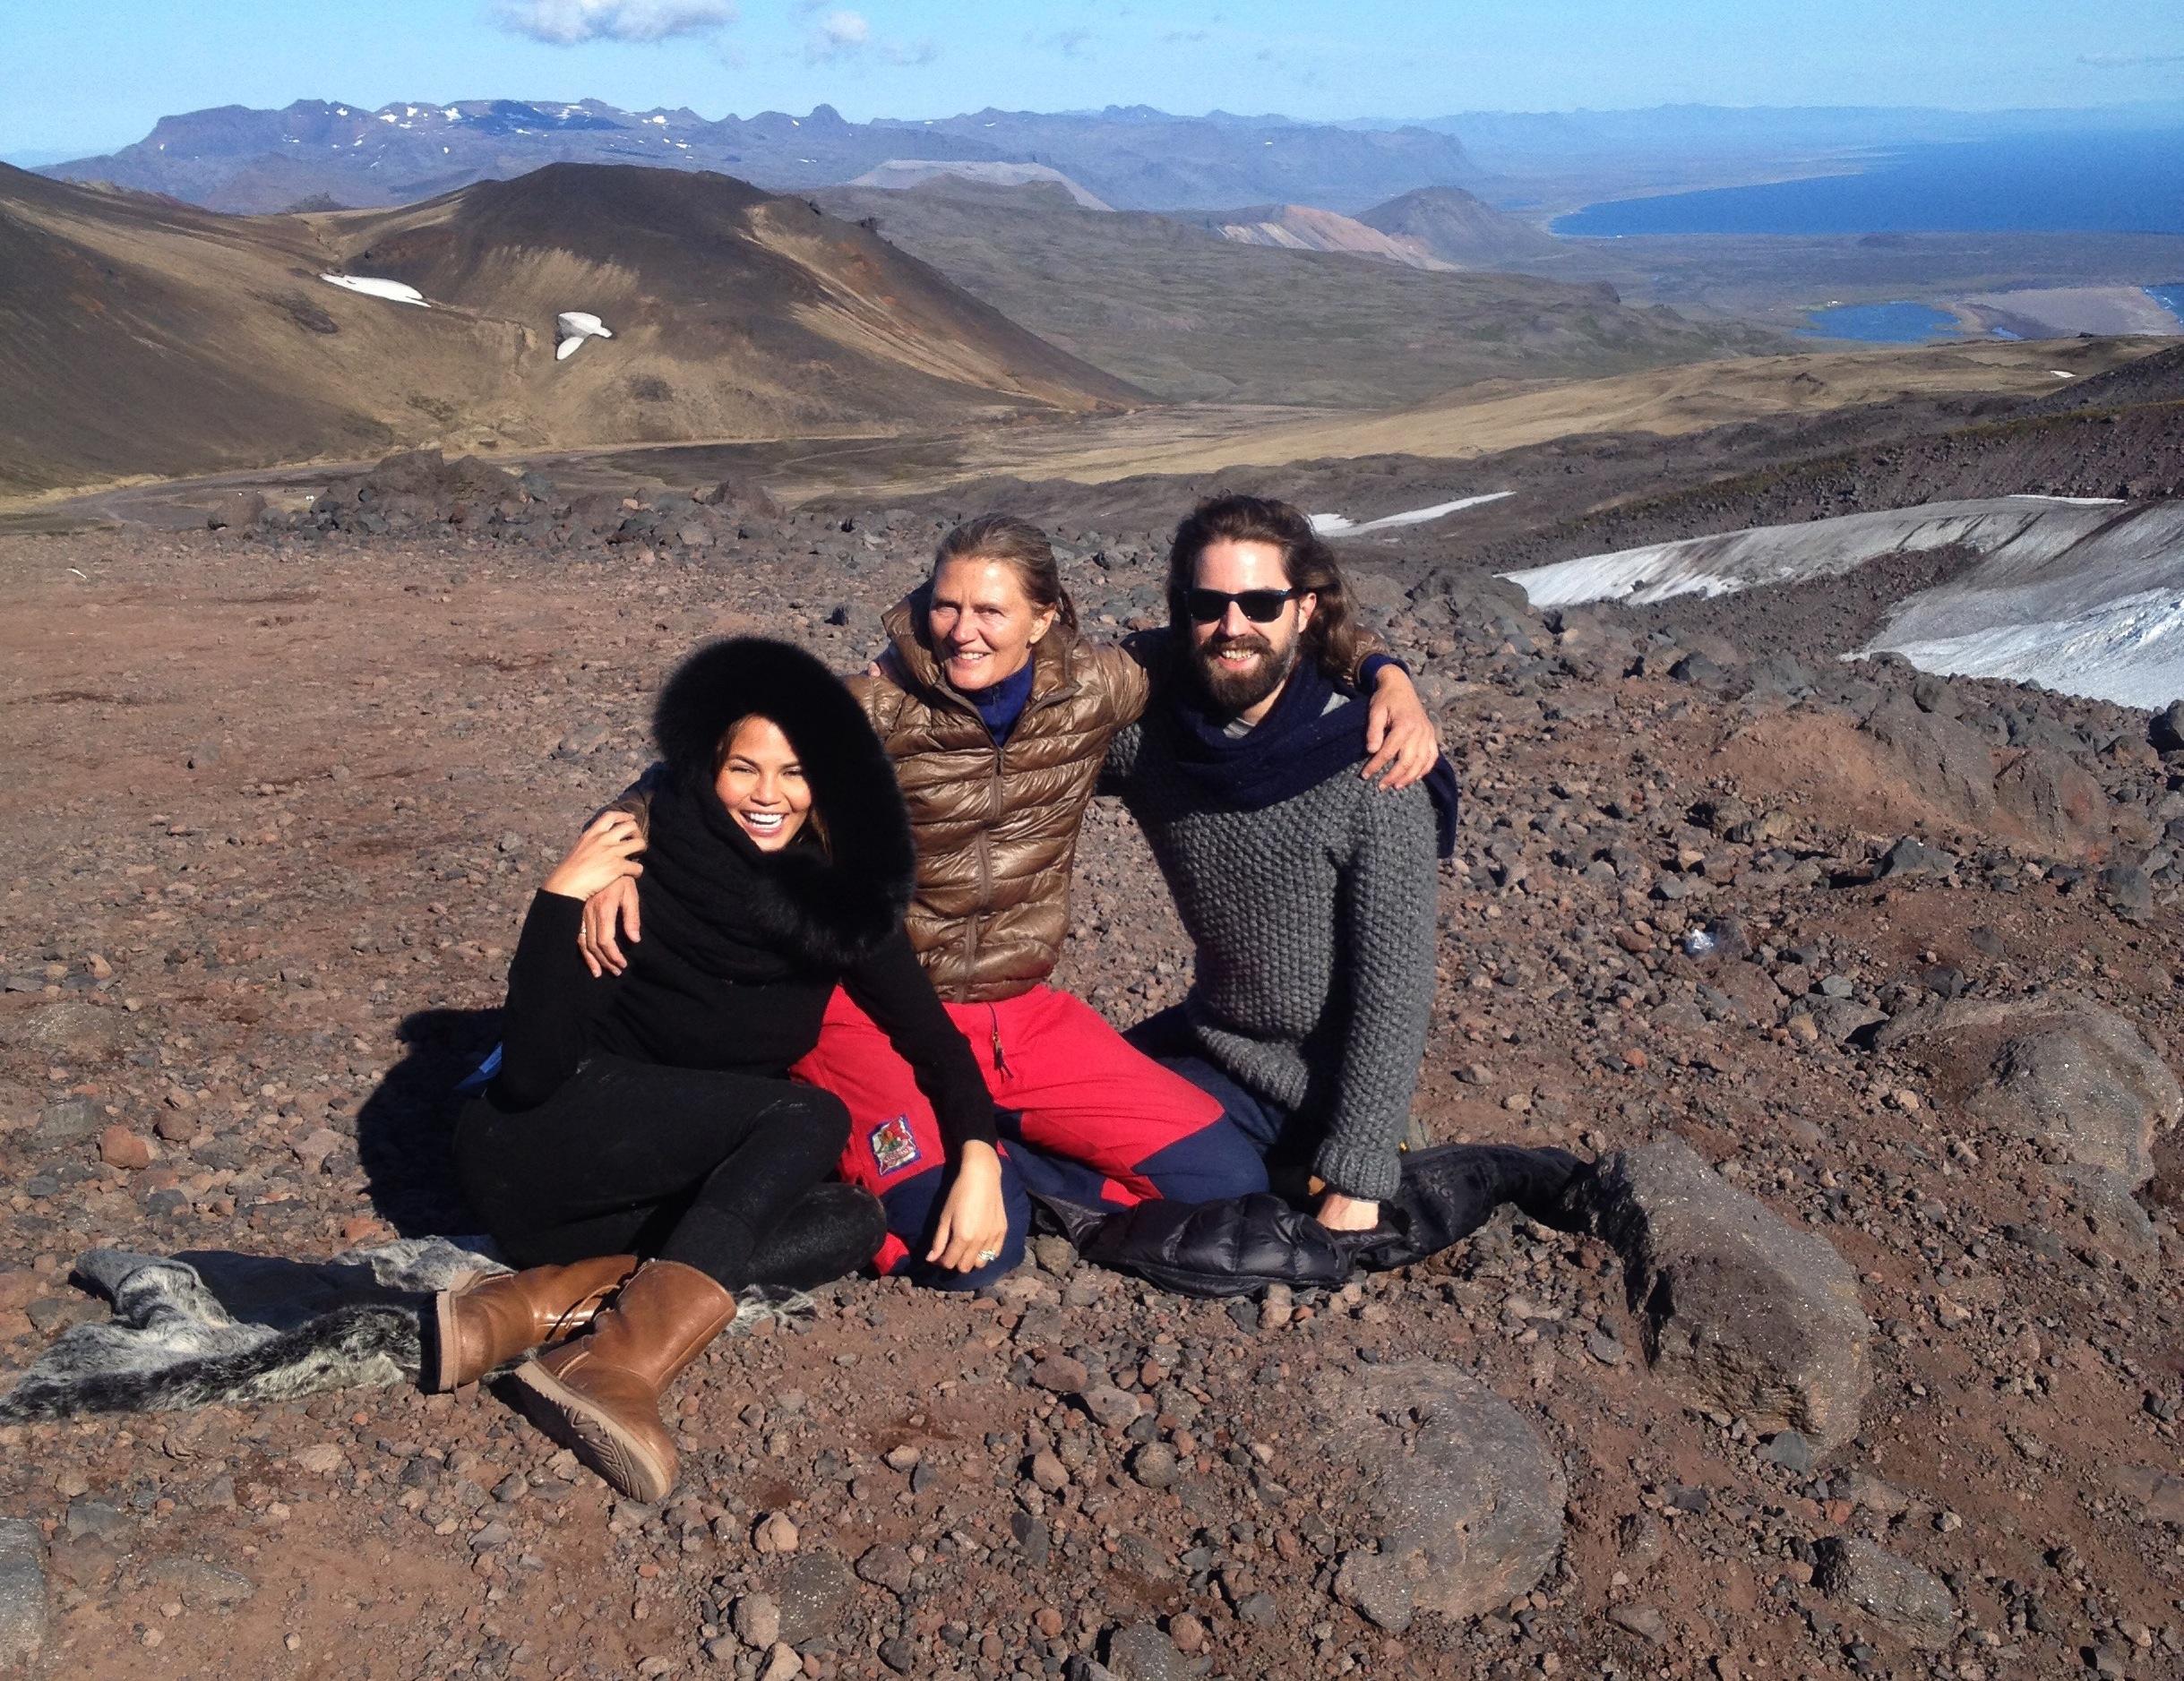 CathrineWessel_JackGuiness_ChrissyTeigan_UggsAustraliaWinter2015_Iceland